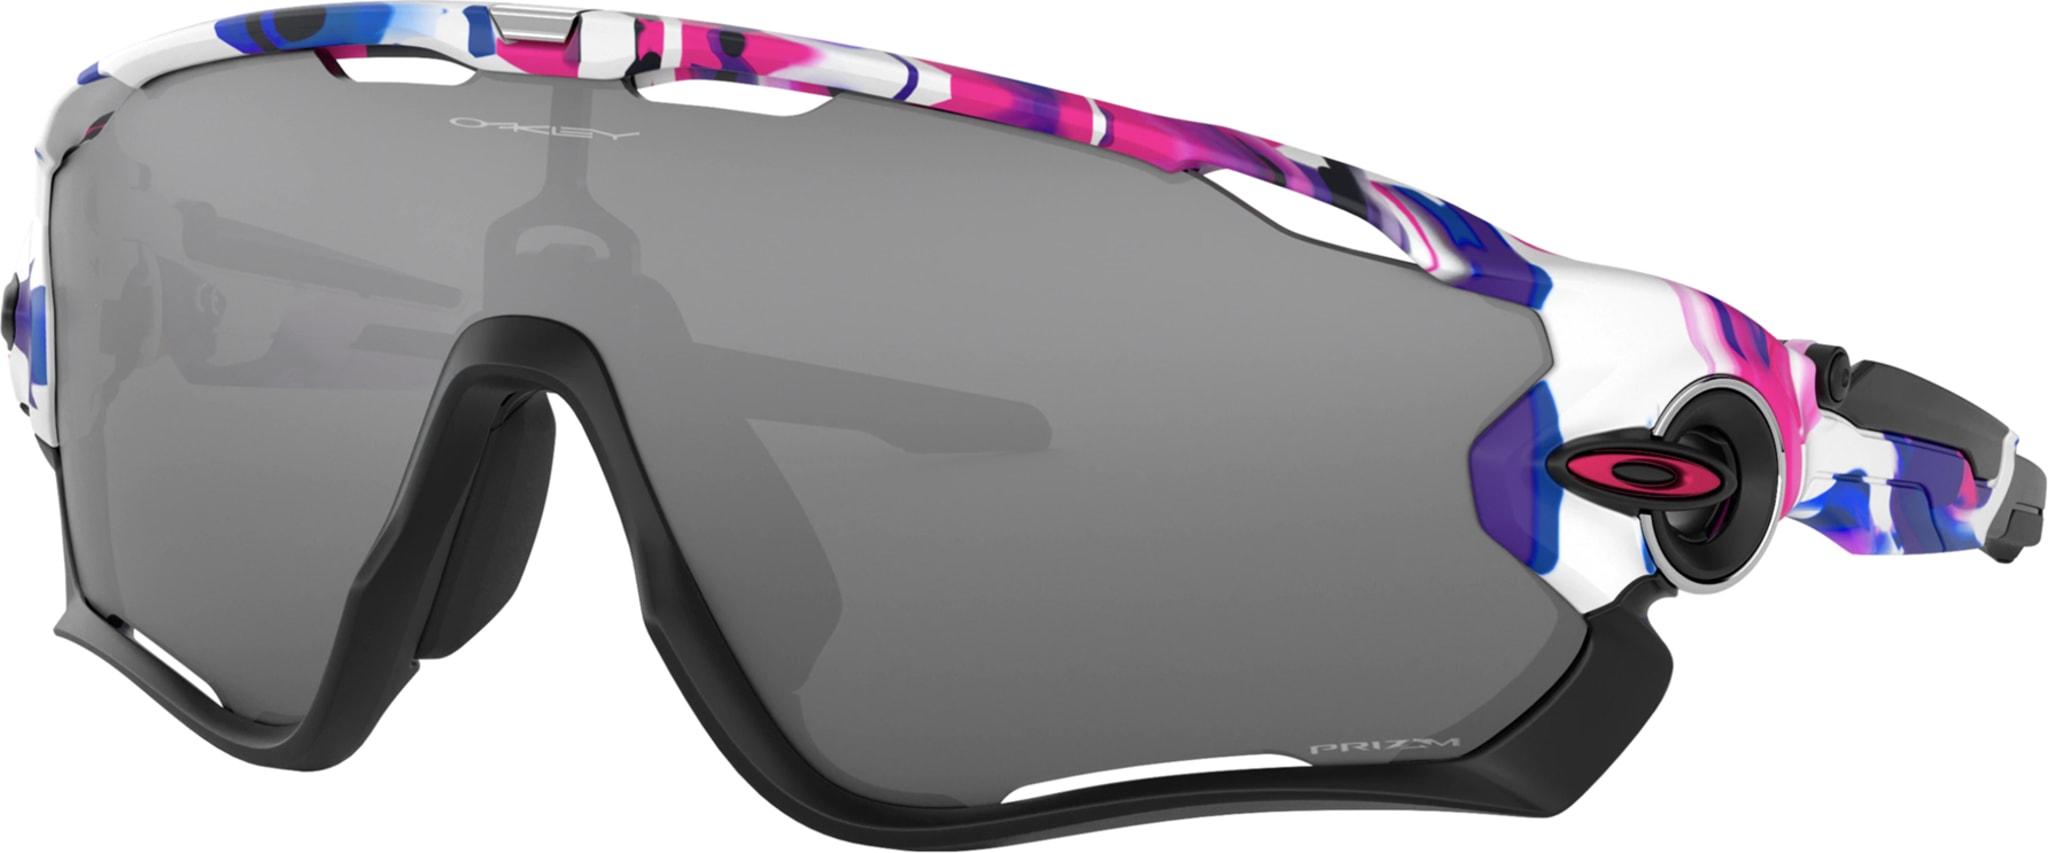 De feteste sportsbrillene!